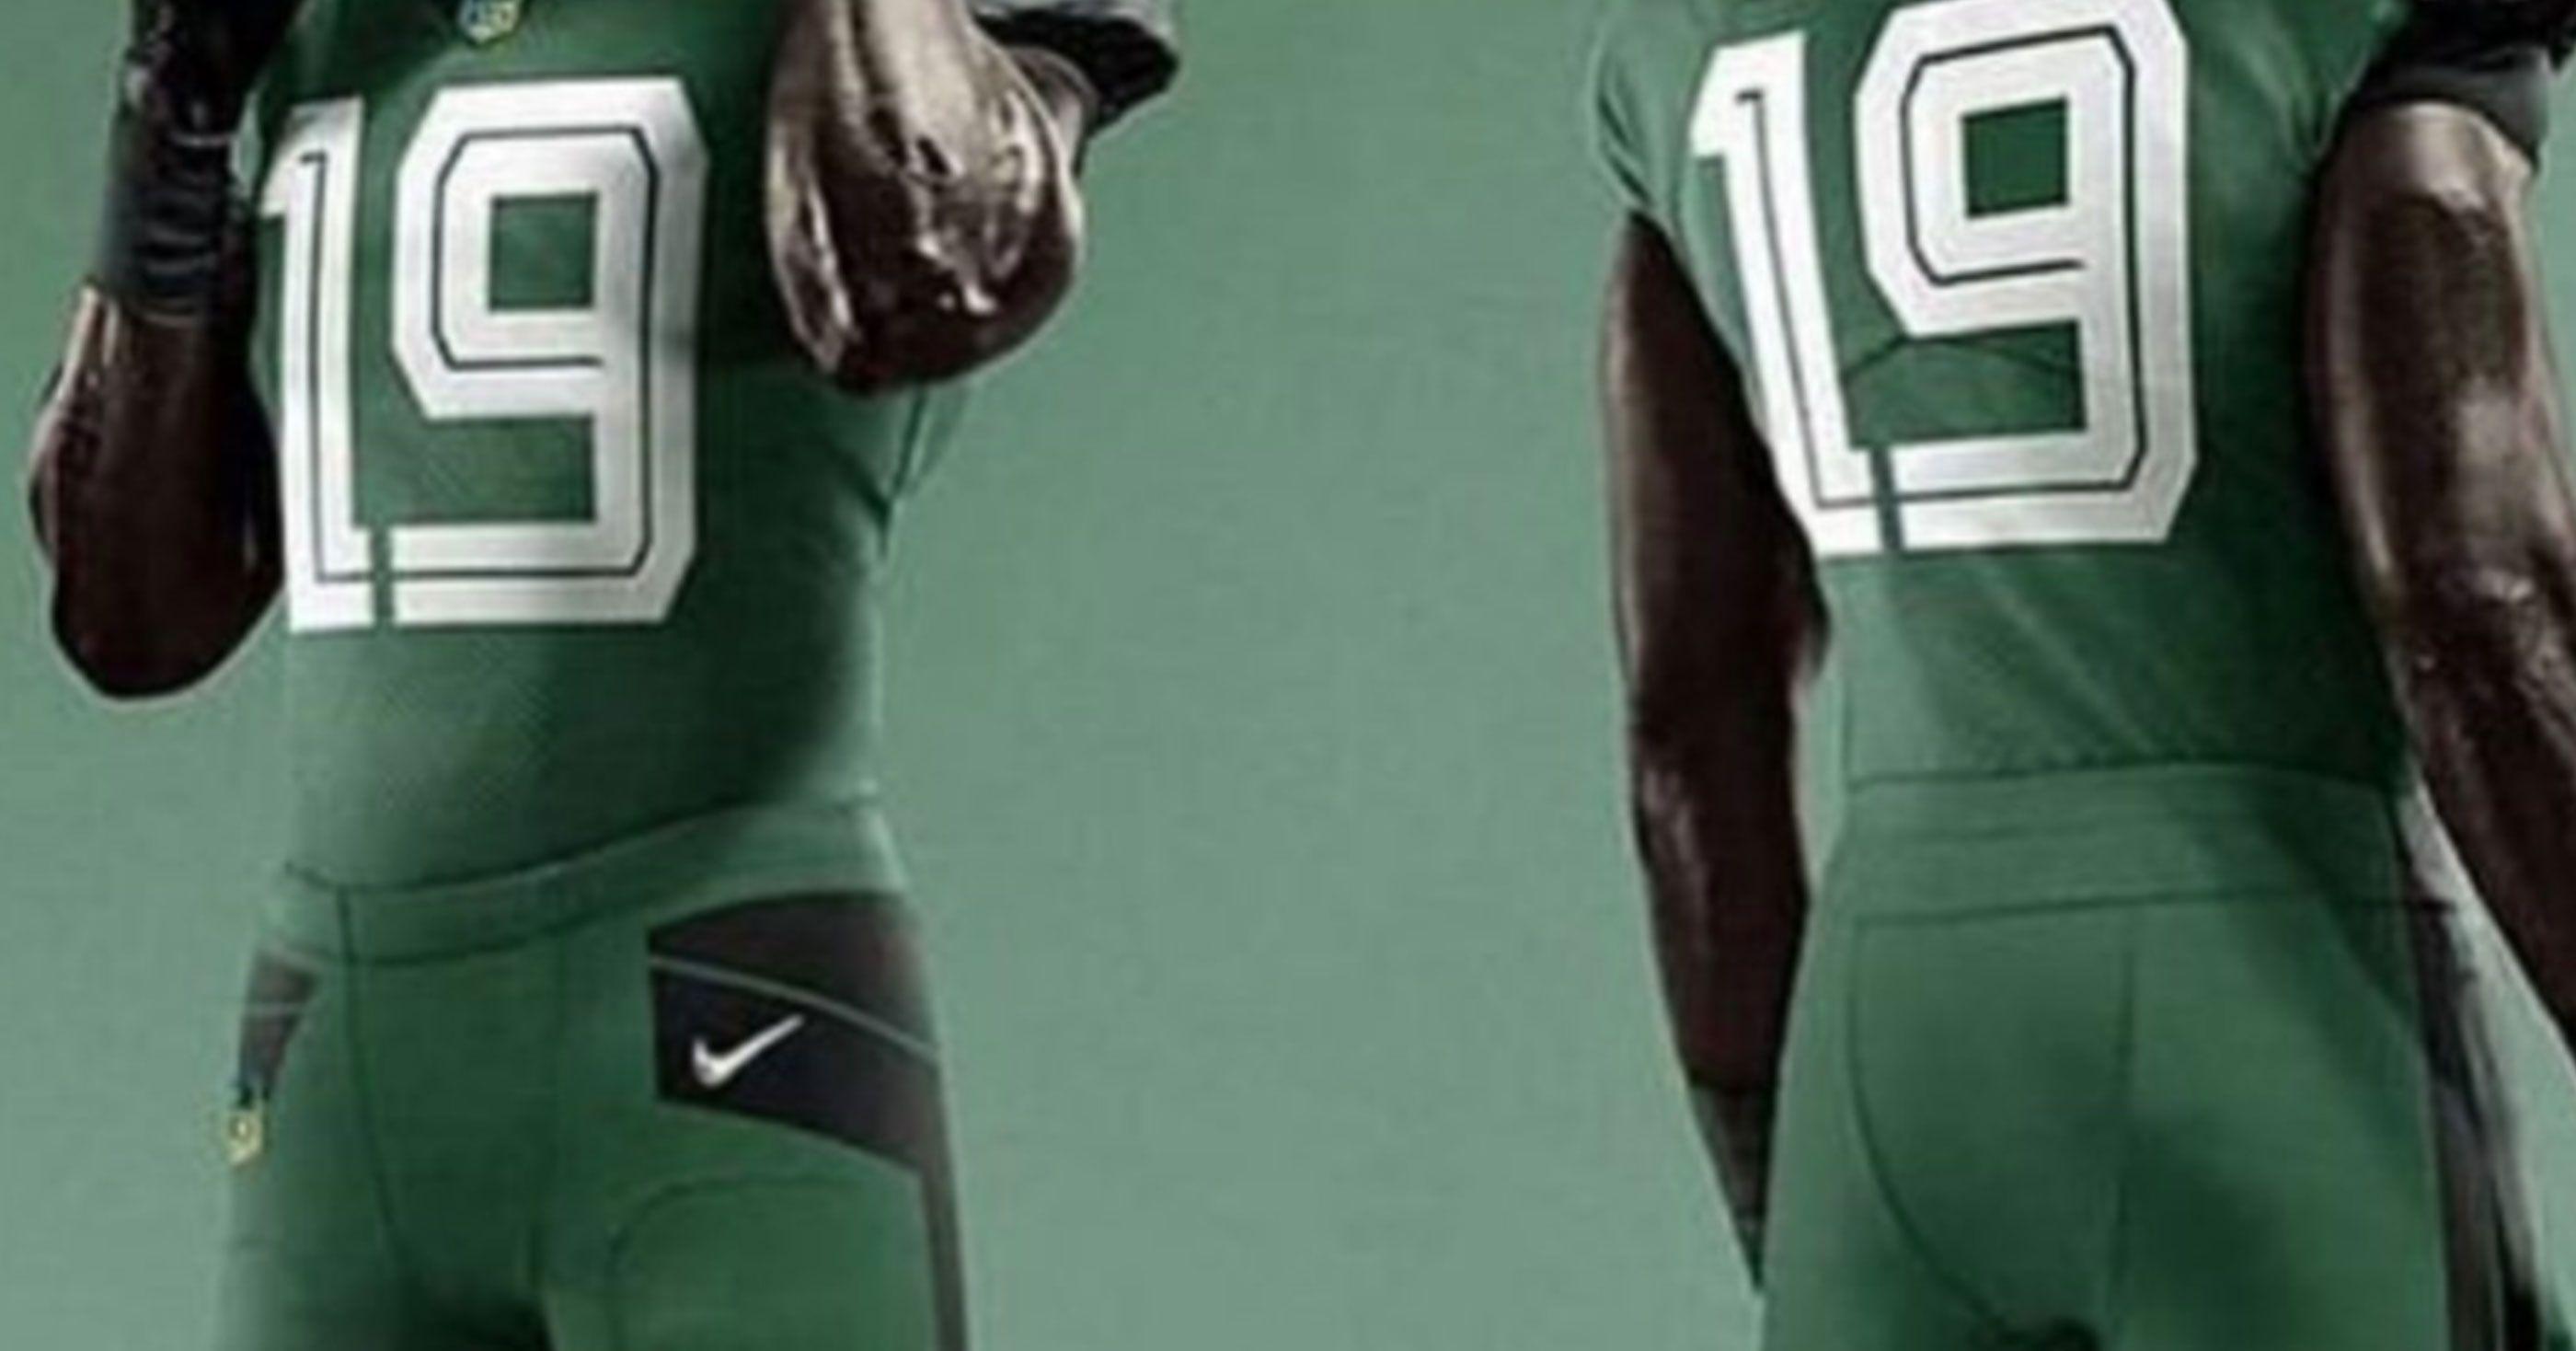 new york jets new uniforms